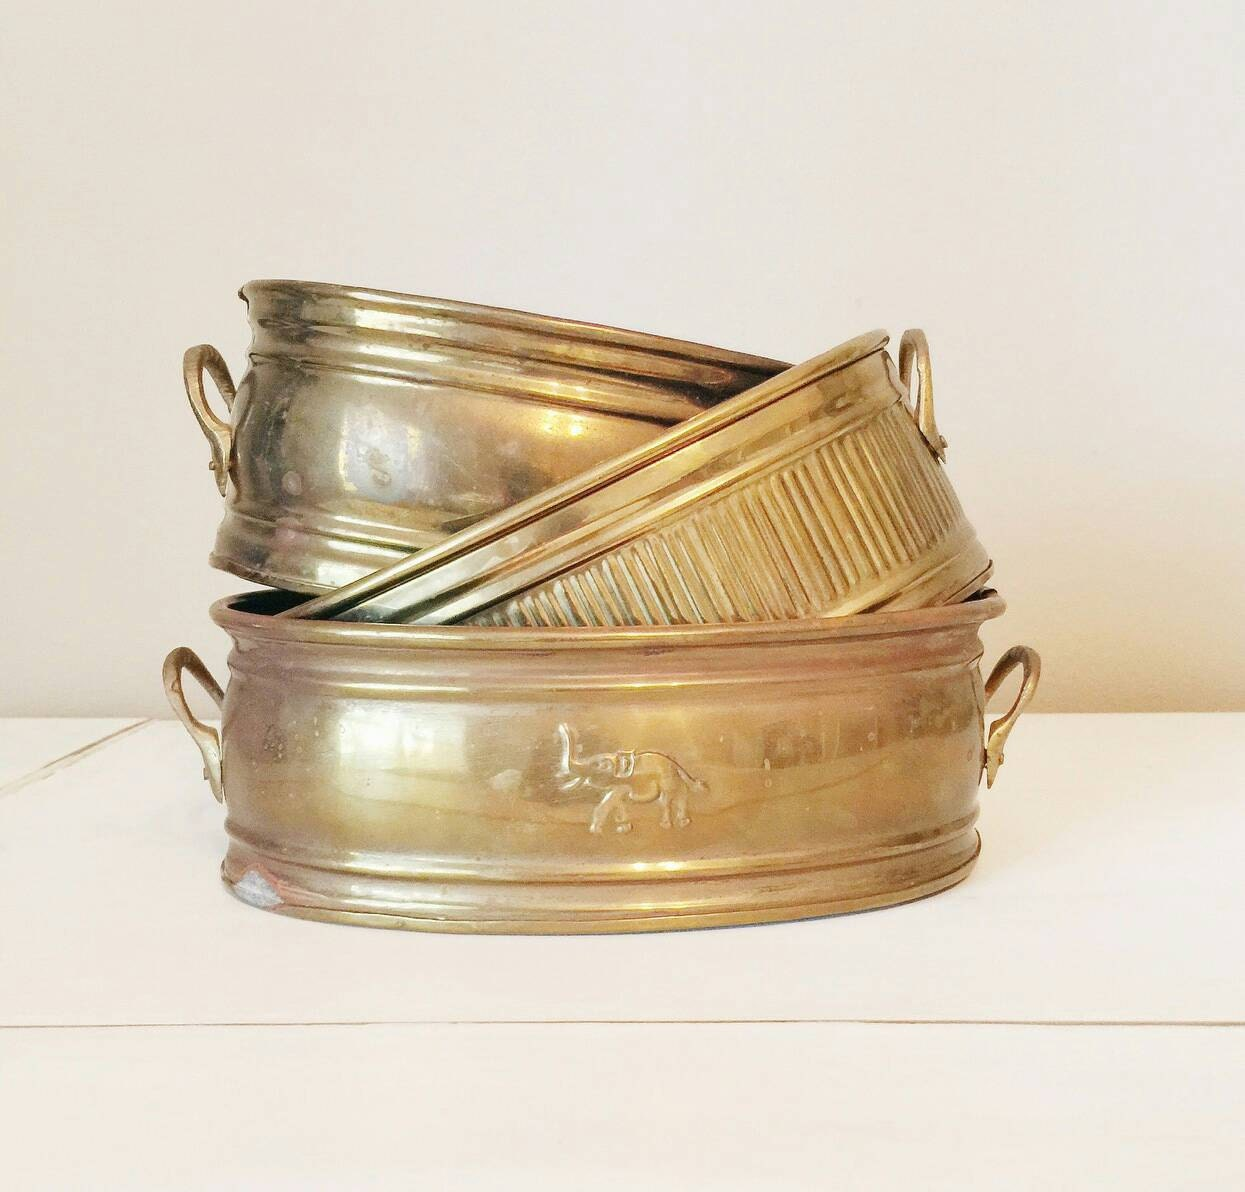 Brass Home Decor: Vintage Brass Planters Vintage Brass Vintage Home Decor